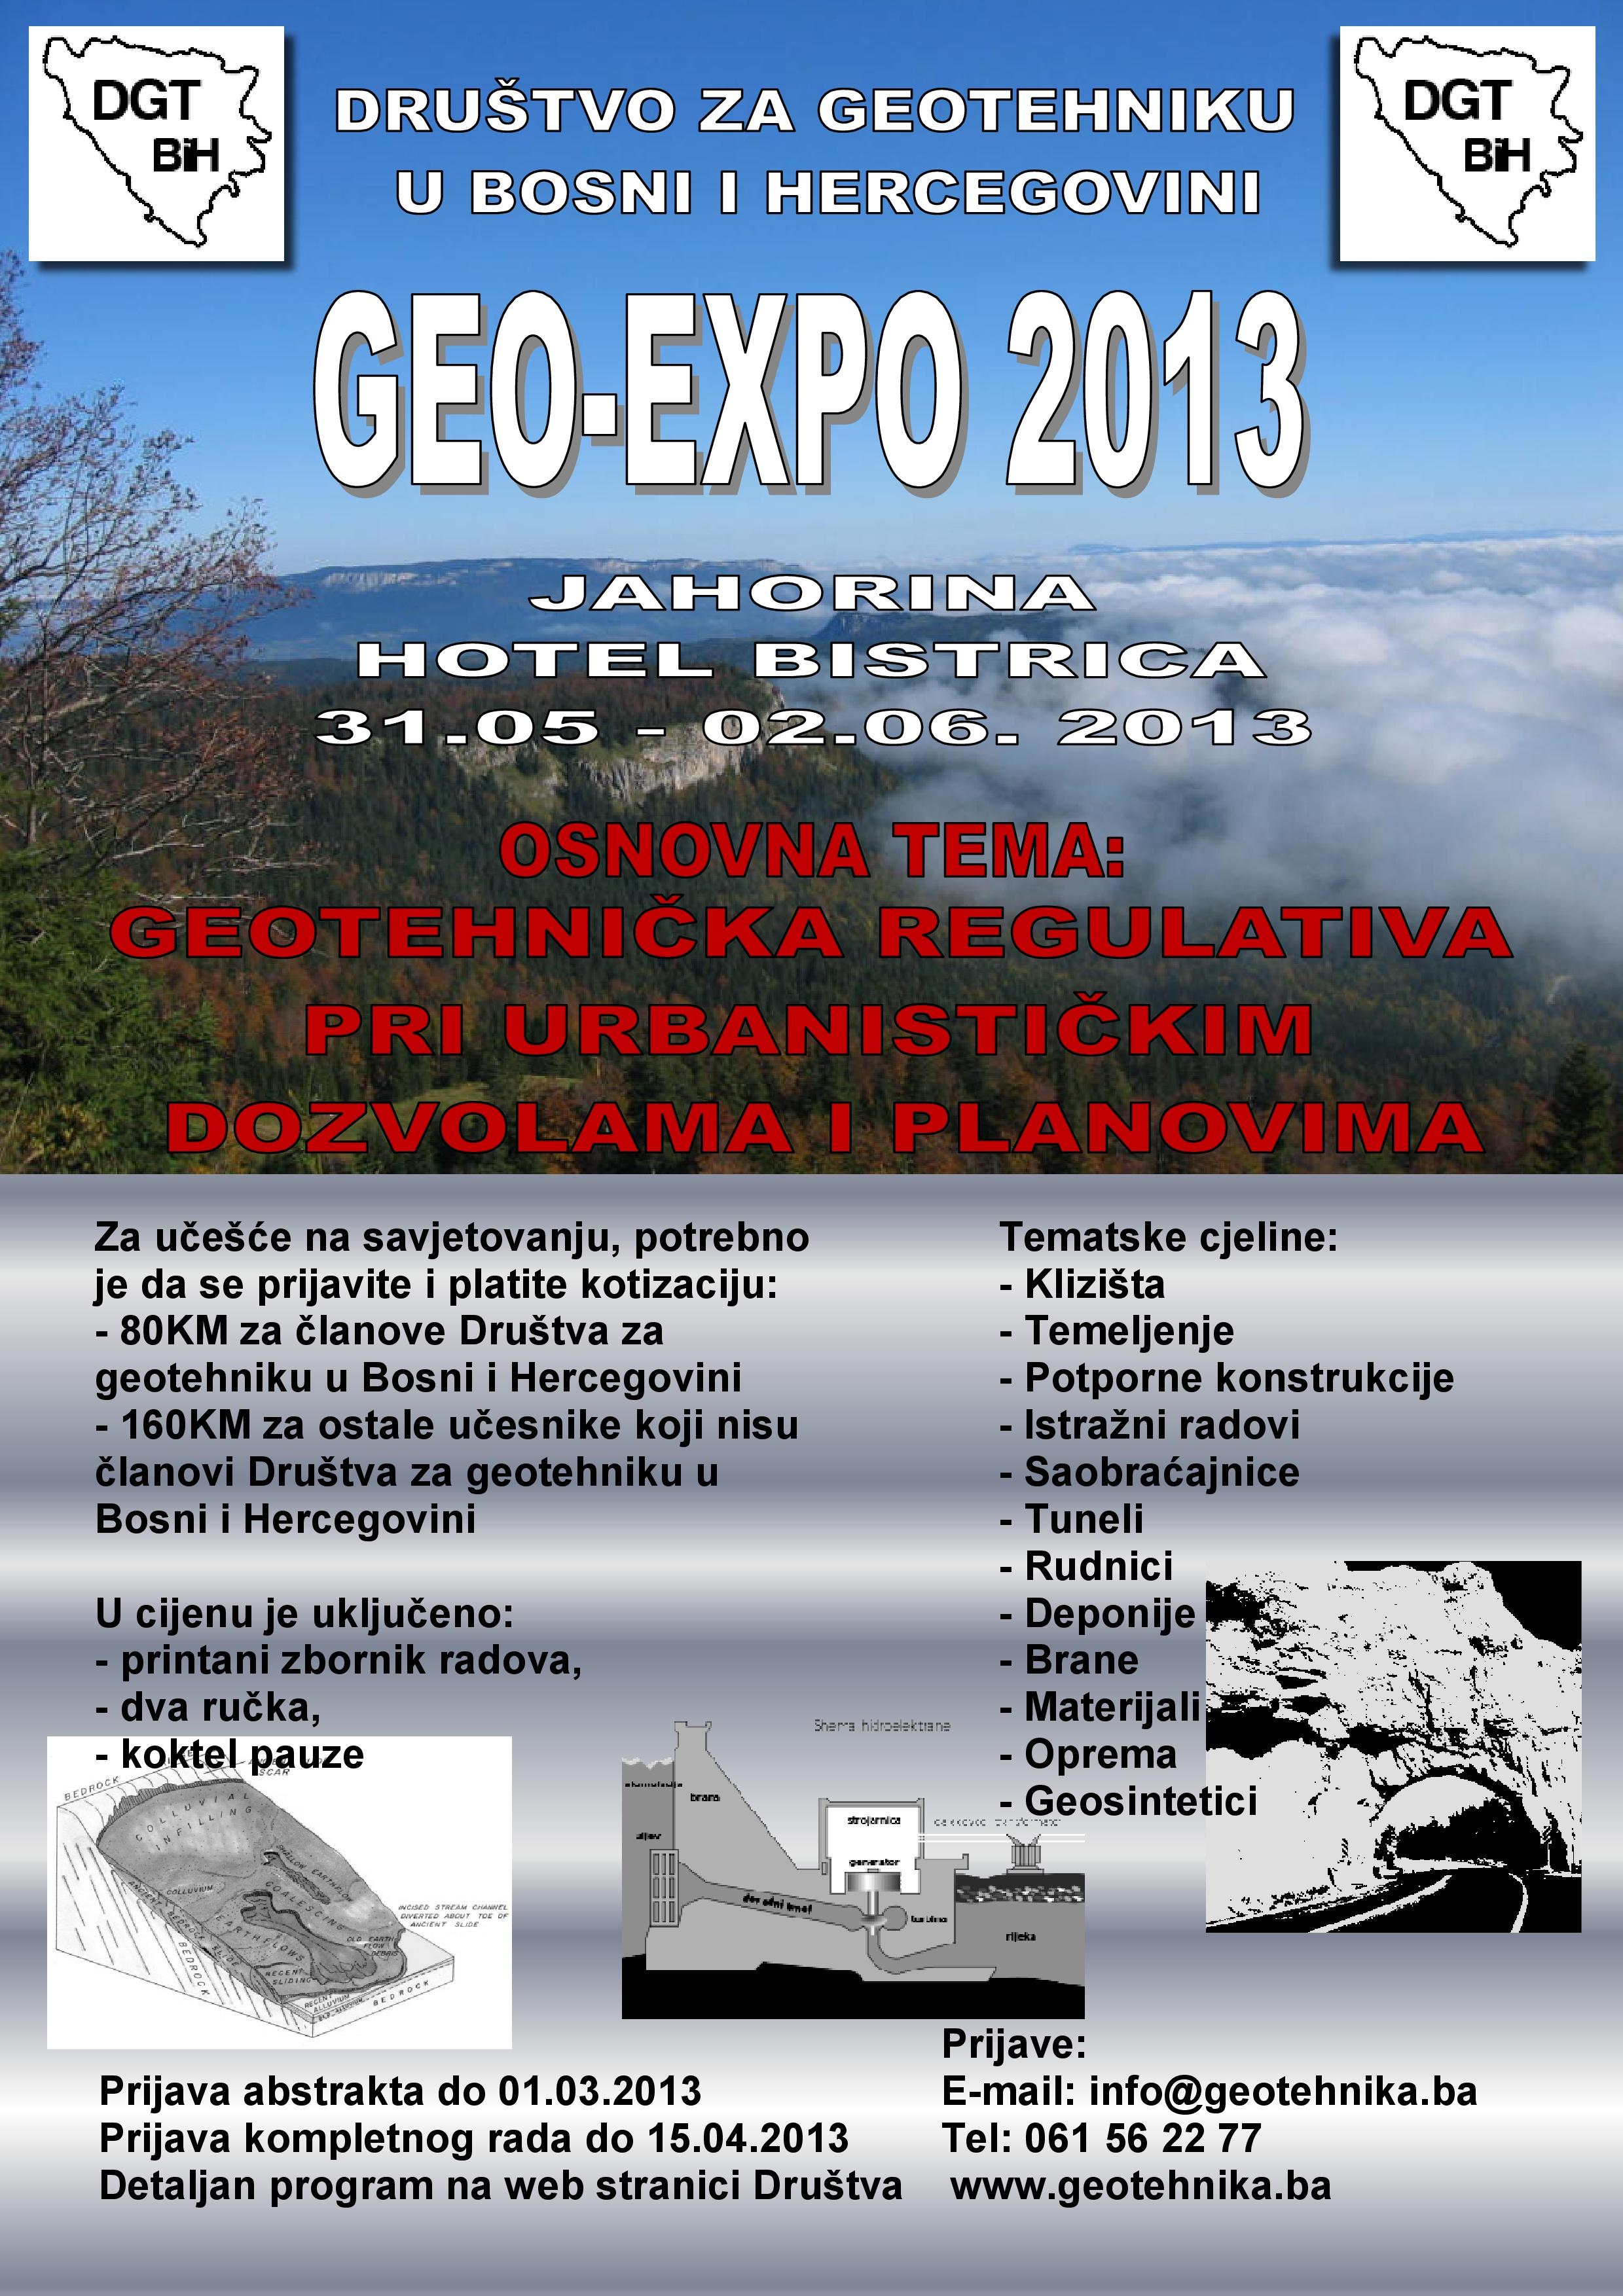 GEO-EXPO 2013, od 31.05. do 02.06. 2013. na Jahorini